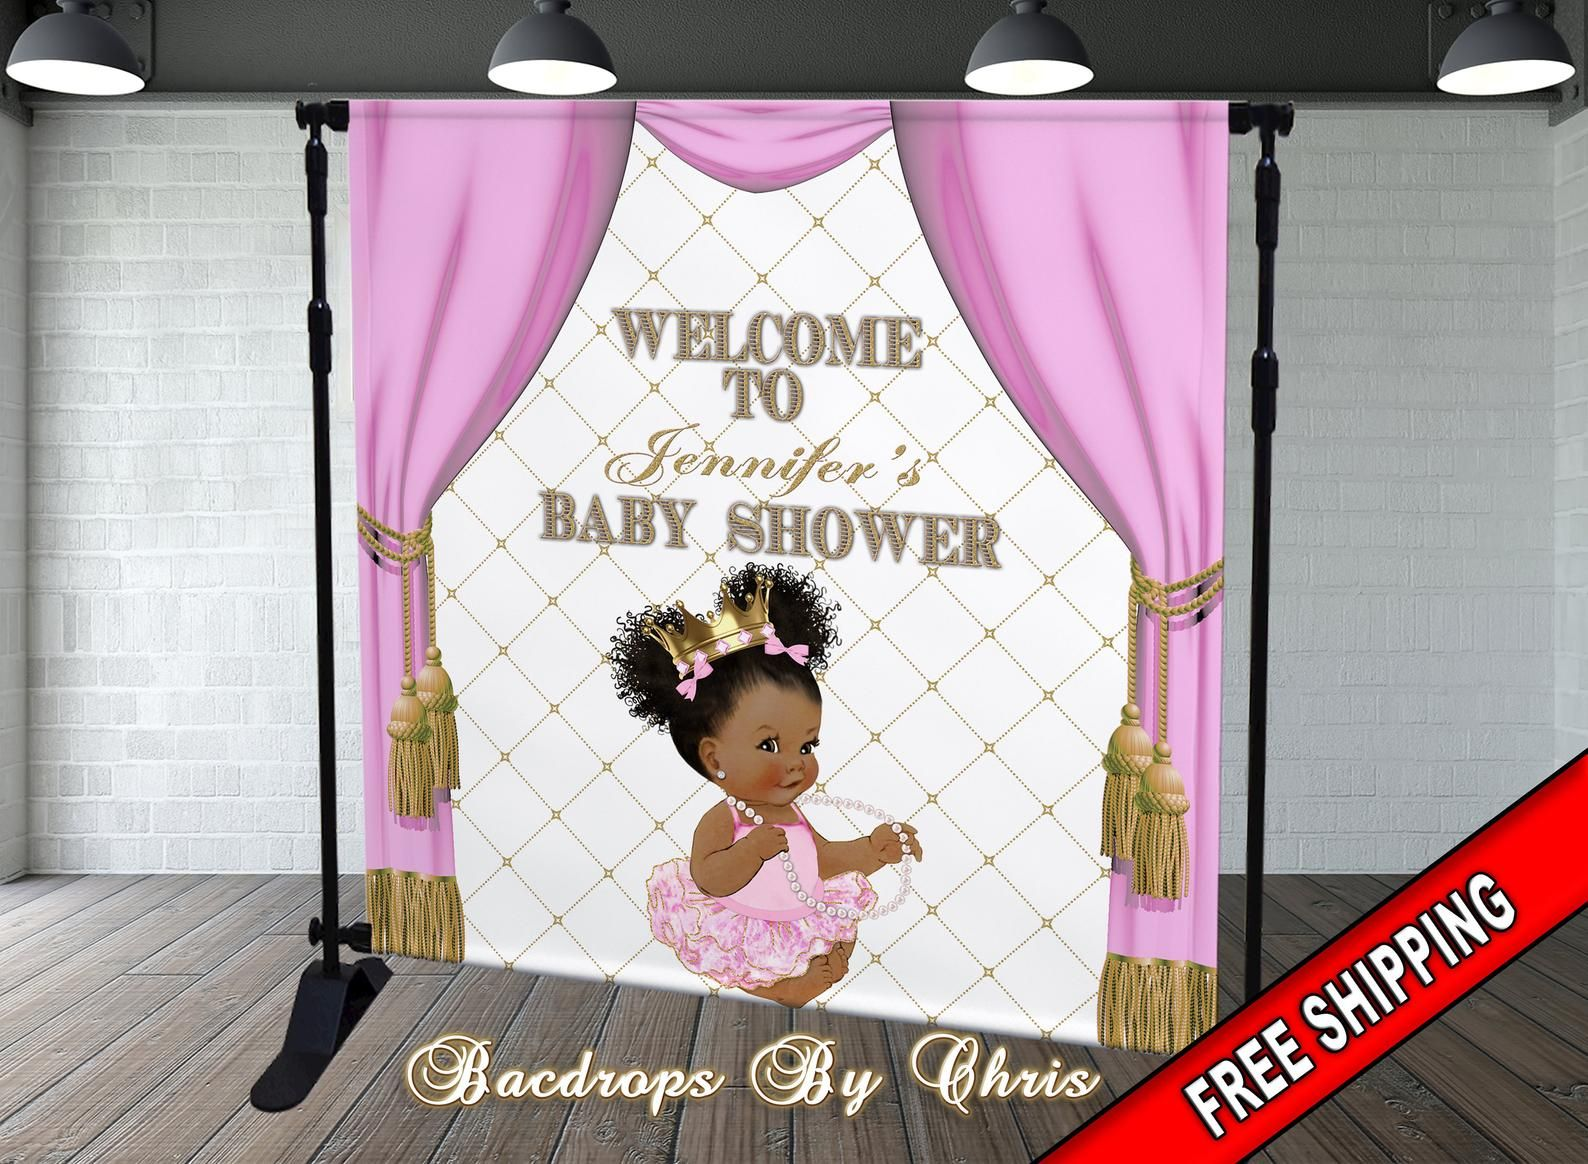 Princess Backdrop Princess Banner Baby Shower Princess Etsy In 2020 Princess Backdrops Princess Banner Baby Shower Princess